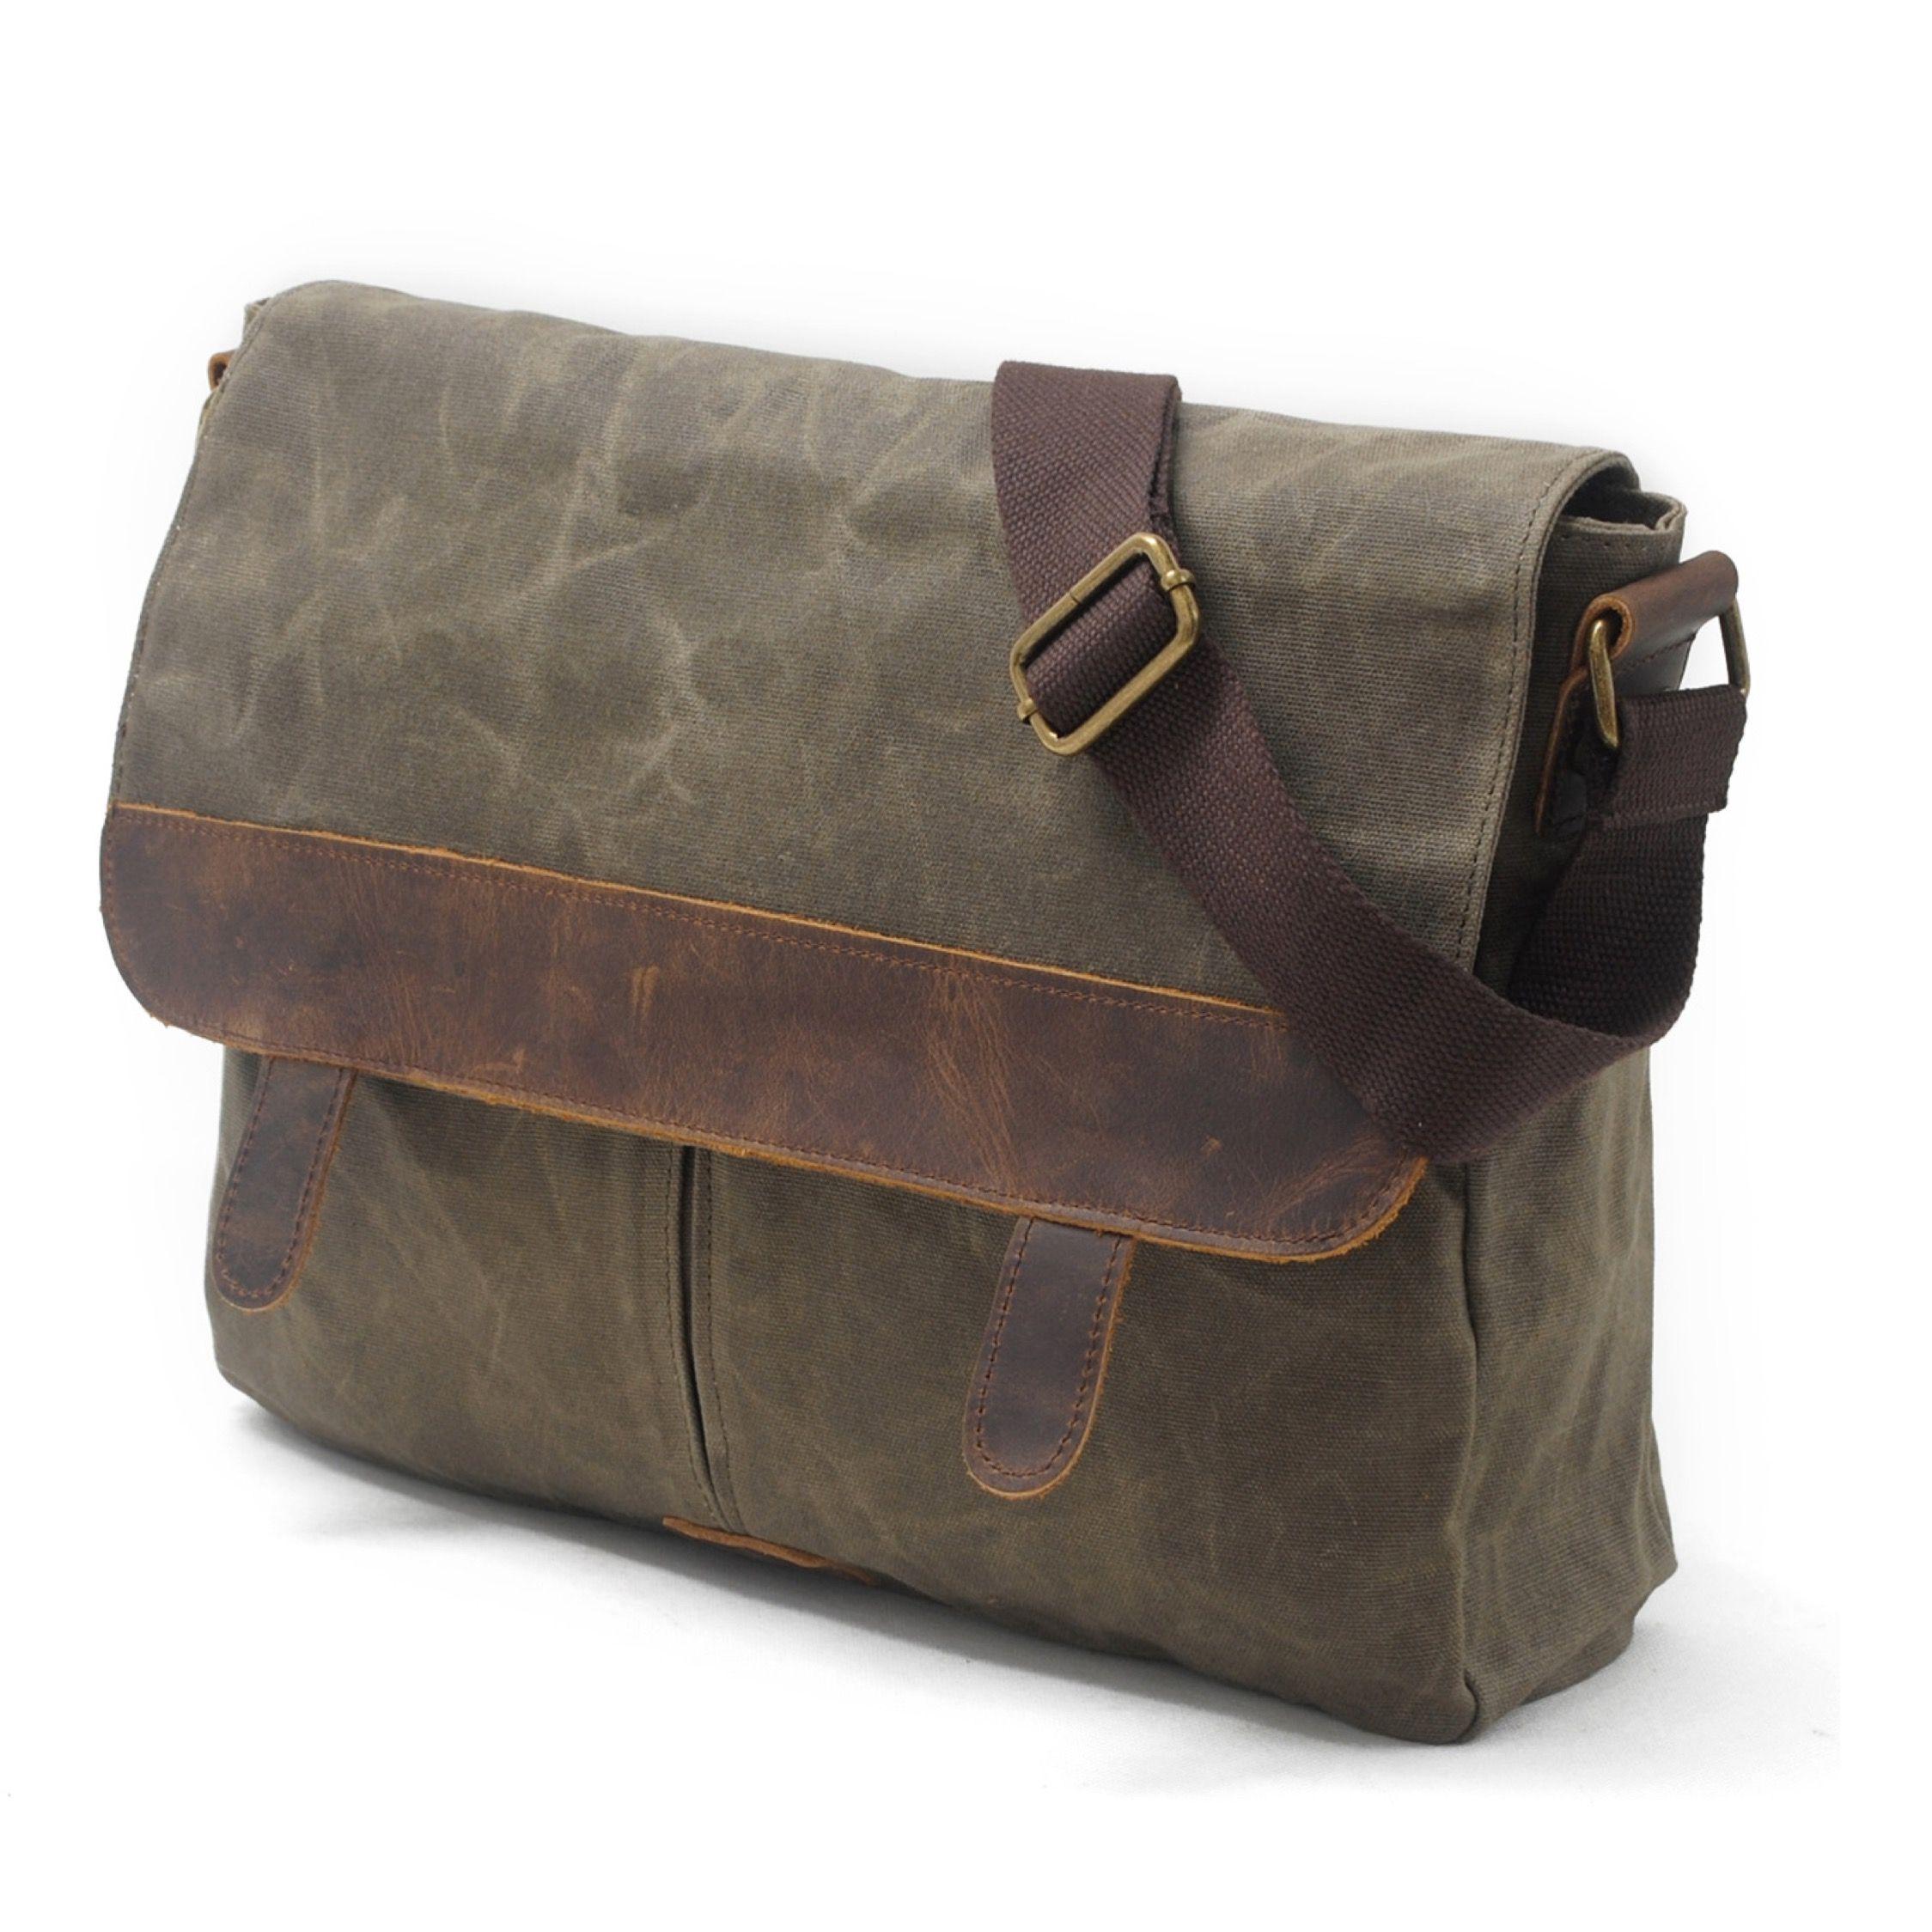 Handmade Leather Green Messenger Bag Satchel Briefcase Men Waxed Canvas